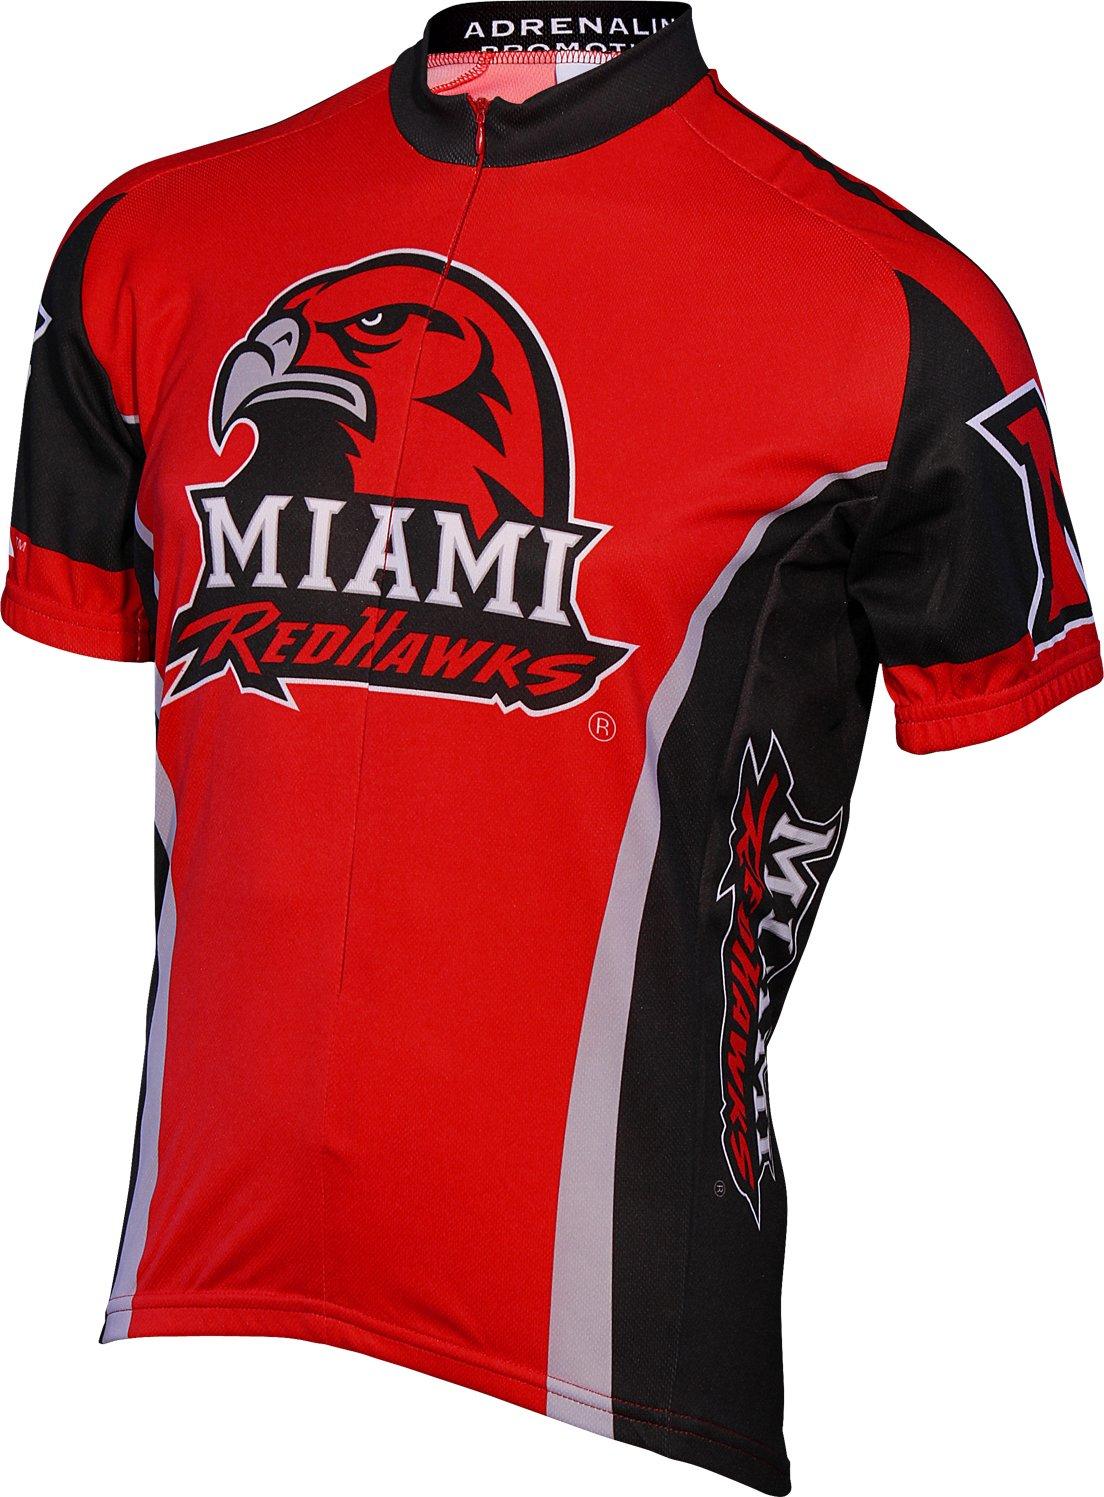 Adrenaline Promotions NCAA Herren Ohio Miami rot FALKEN Radfahren Jersey